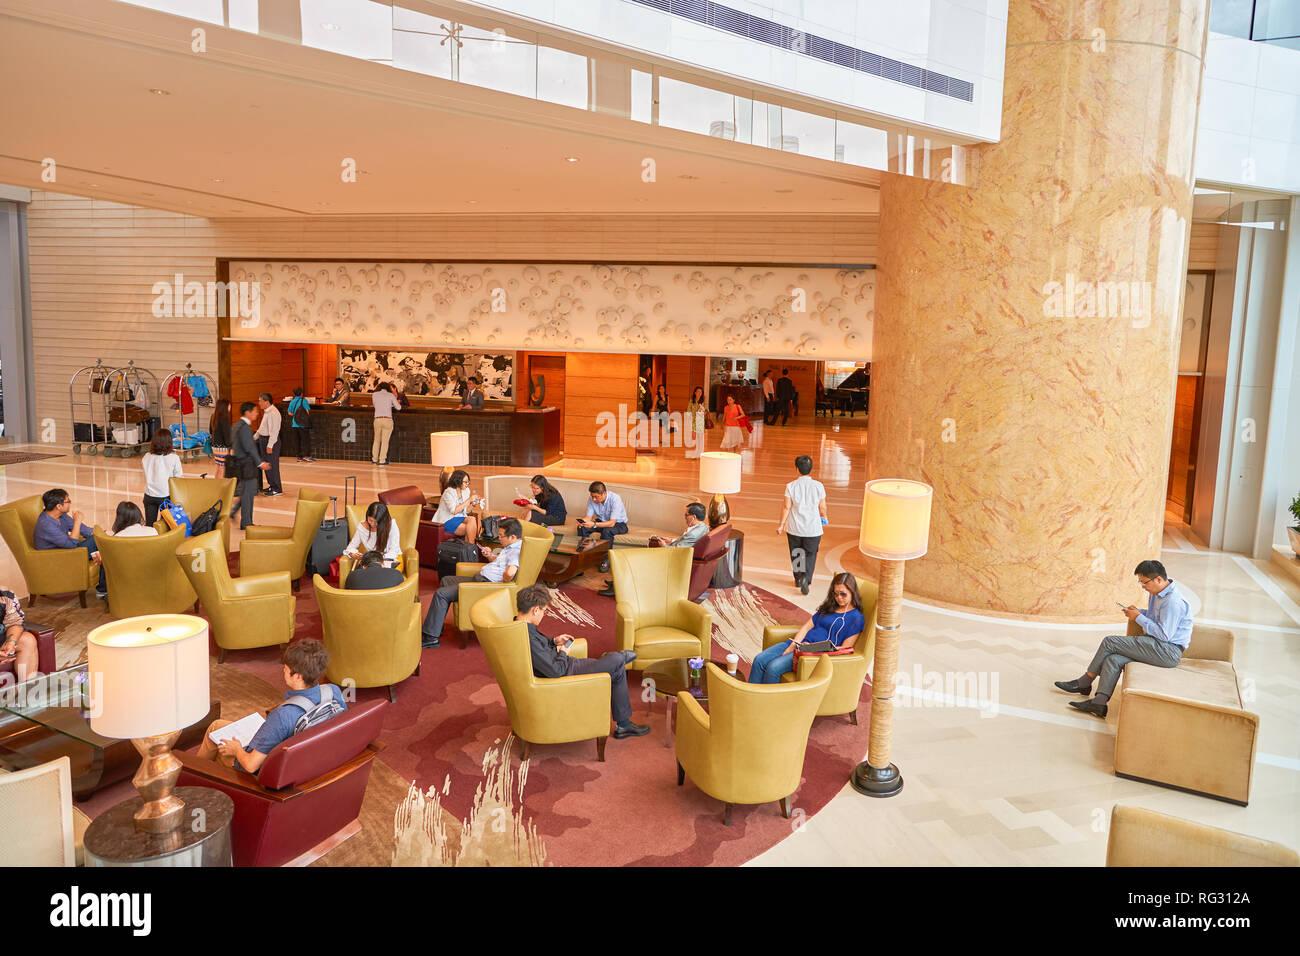 HONG KONG - CIRCA SEPTEMBER, 2016: Four Seasons Hotel Hong Kong Lobby. Four Seasons Hotel Hong Kong is a five-star hotel building in the Sun Hung Kai  Stock Photo